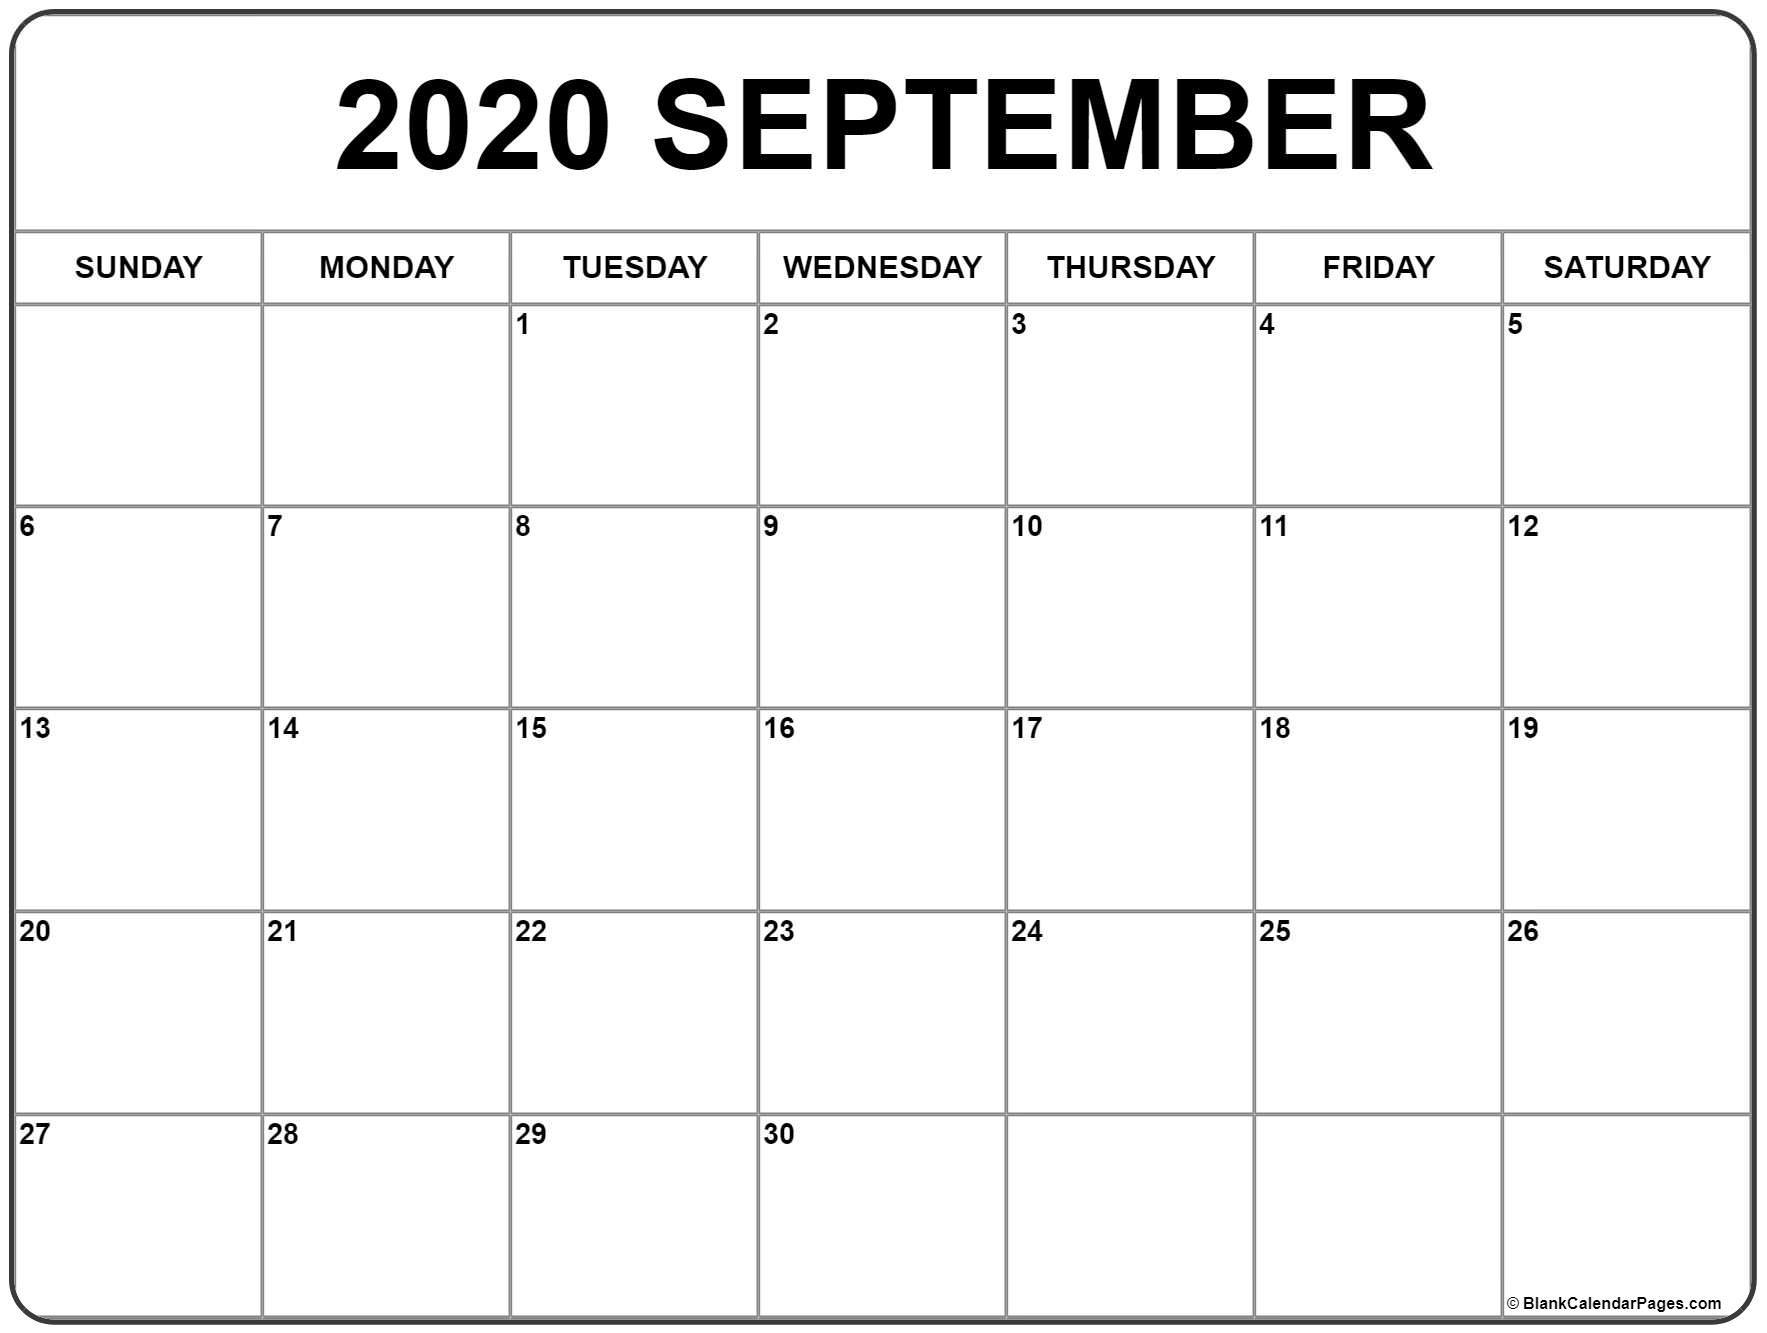 September 2020 Calendar | Free Printable Monthly Calendars  Full Page Calendar Print Out